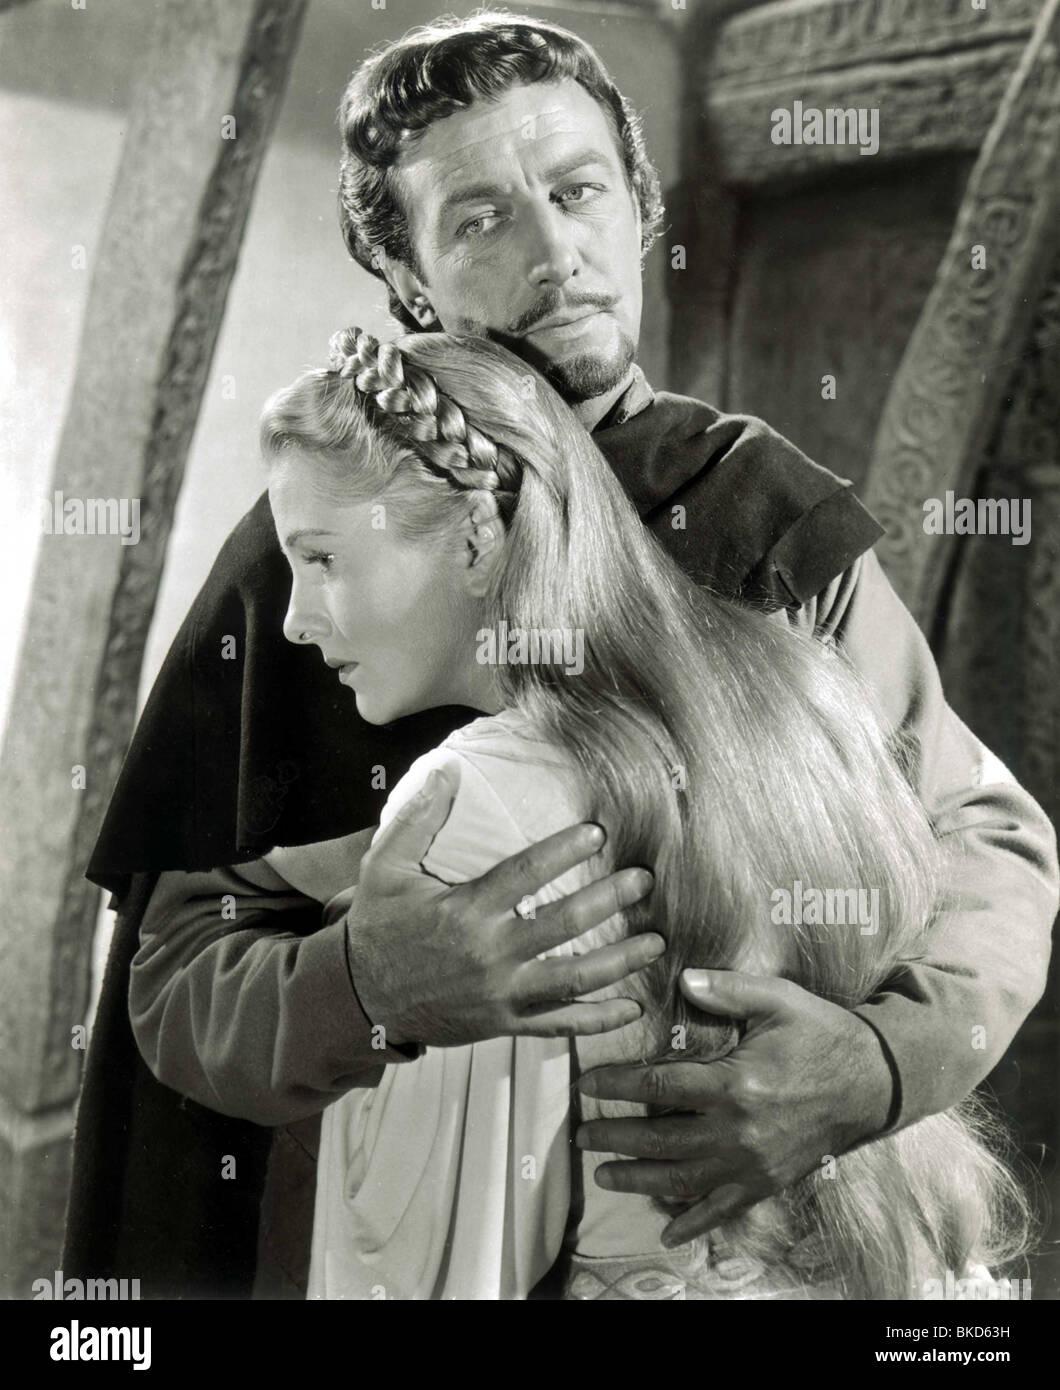 ivanhoe 1952 full movie robert taylor